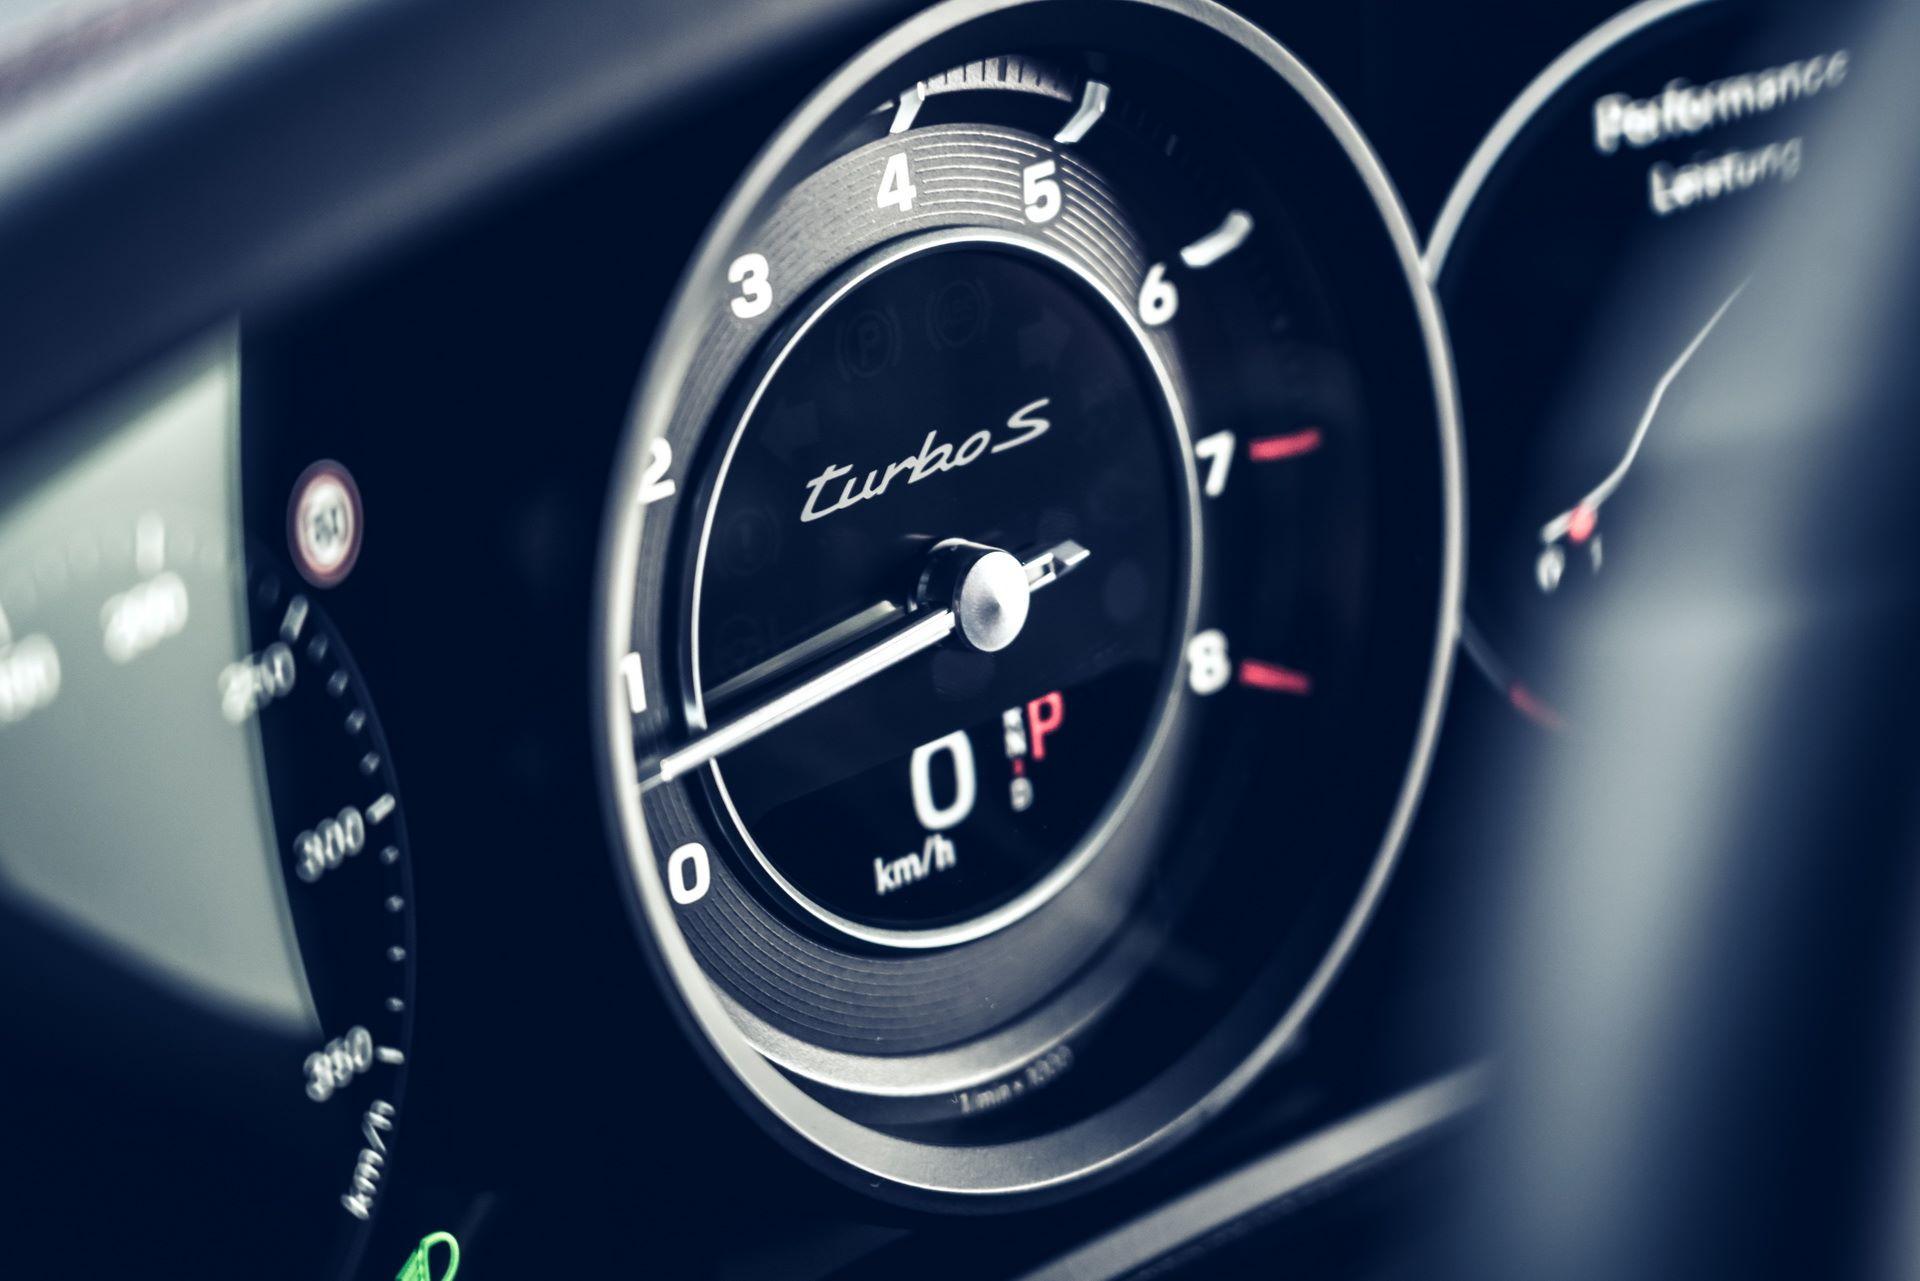 Porsche-911-Turbo-S-2020-21